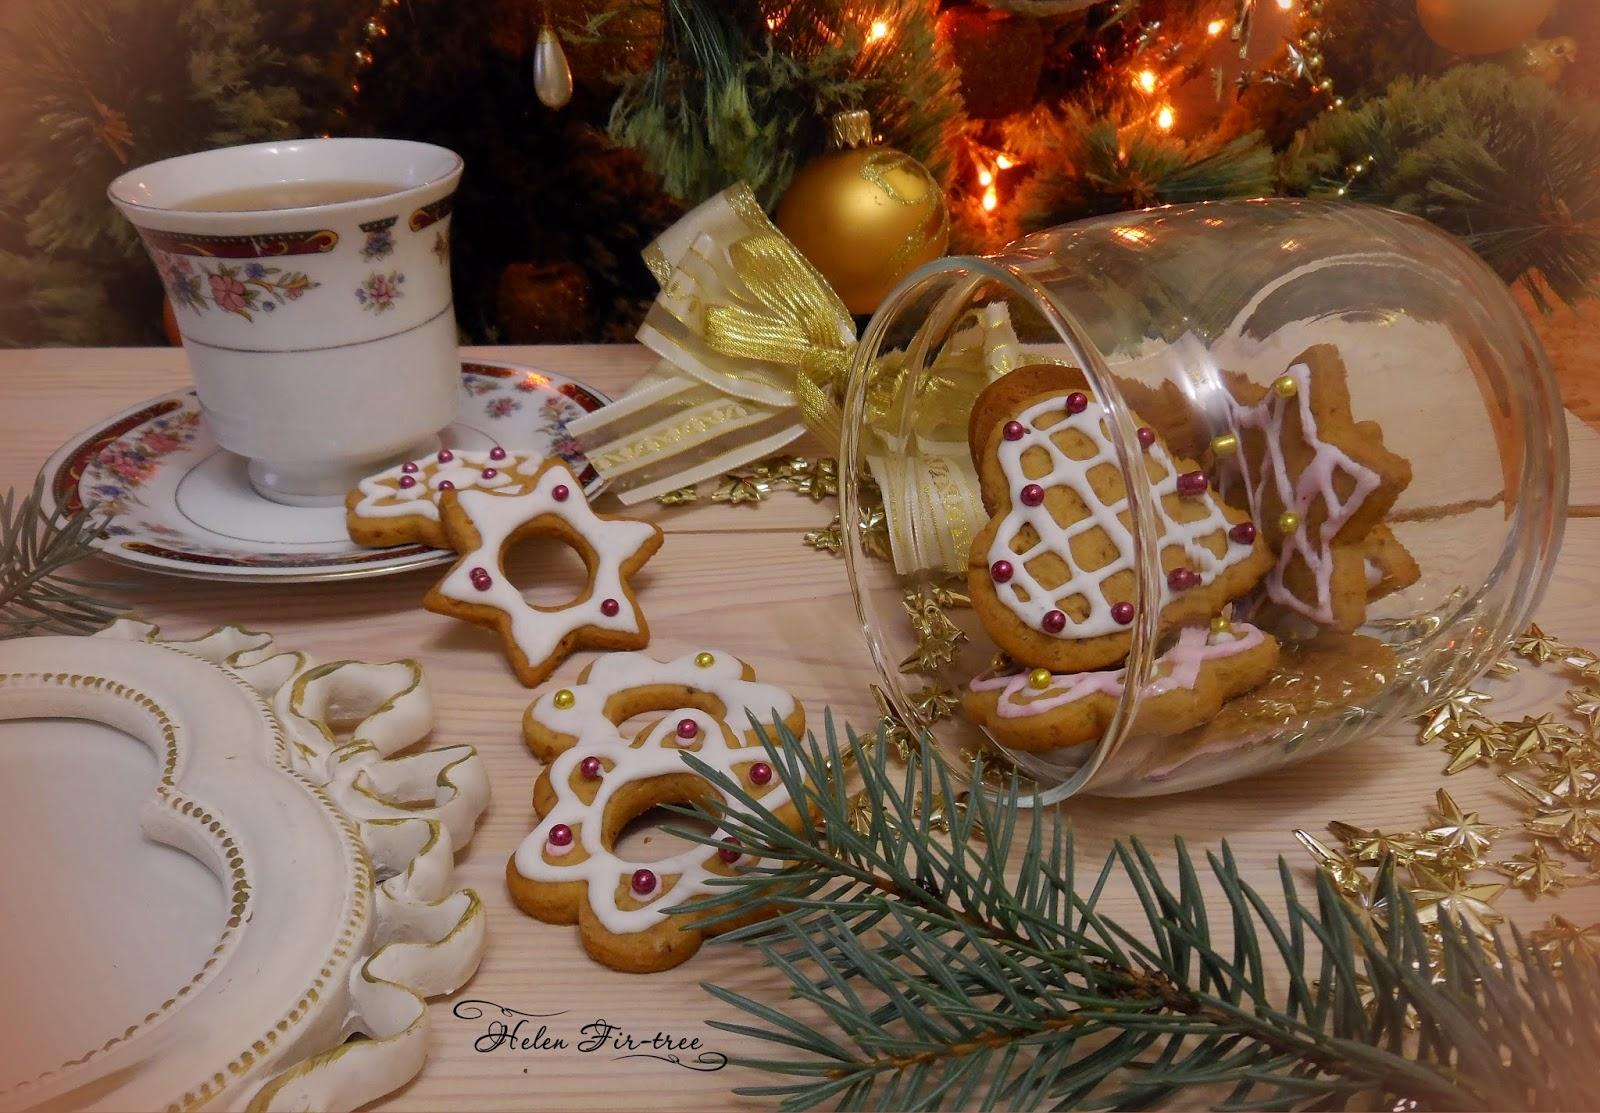 Helen Fir-tree Рождественское печенье Christmas cookies